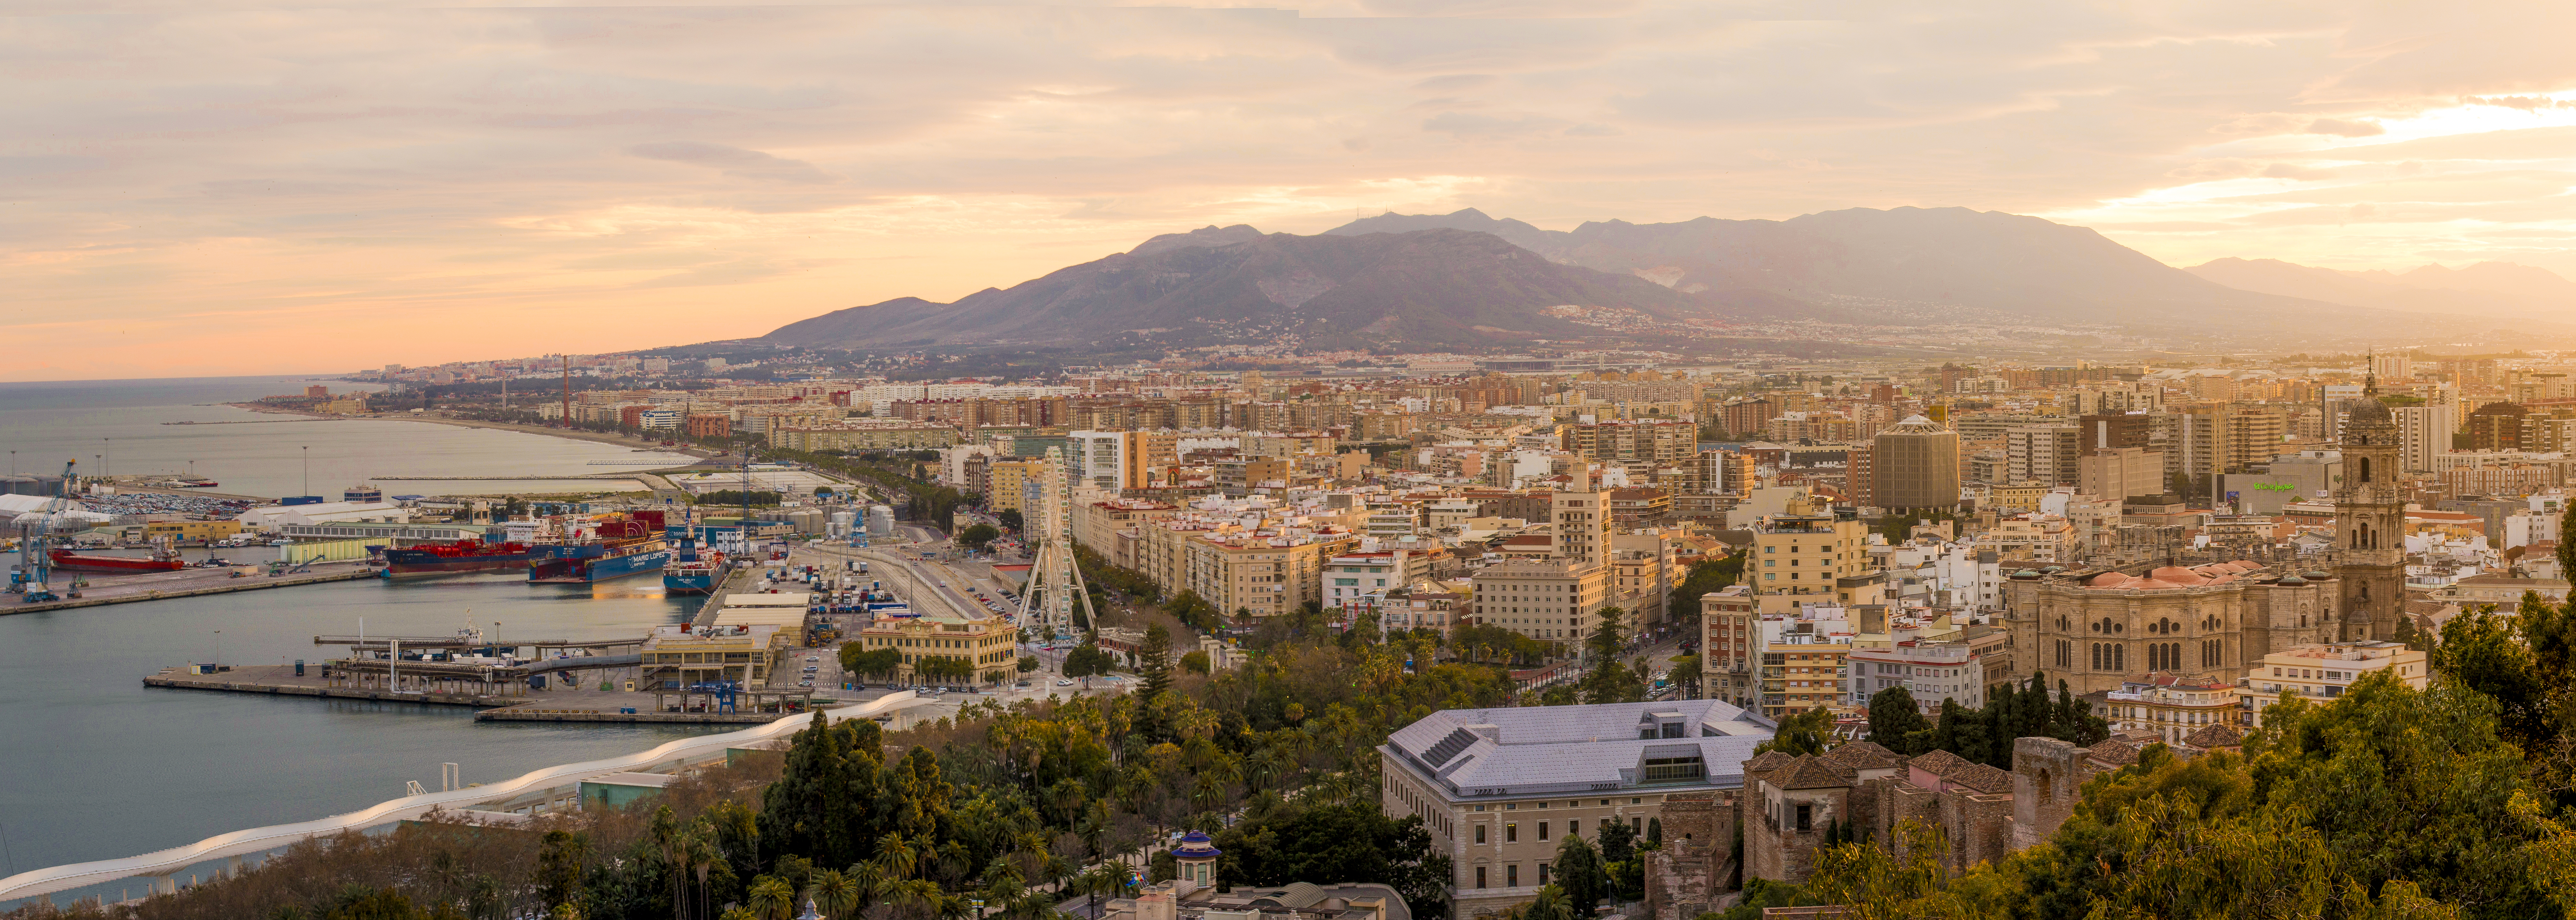 Mudarse a Málaga desde Madrid 29